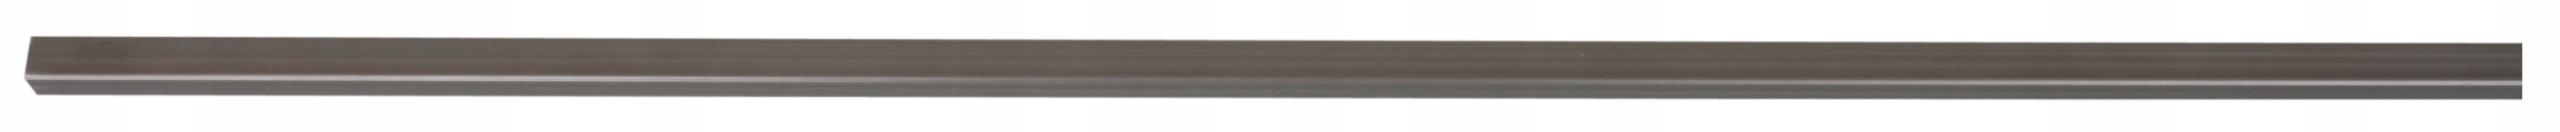 Клинкерная планка KAEM 8 мм x 10 мм, 2 м